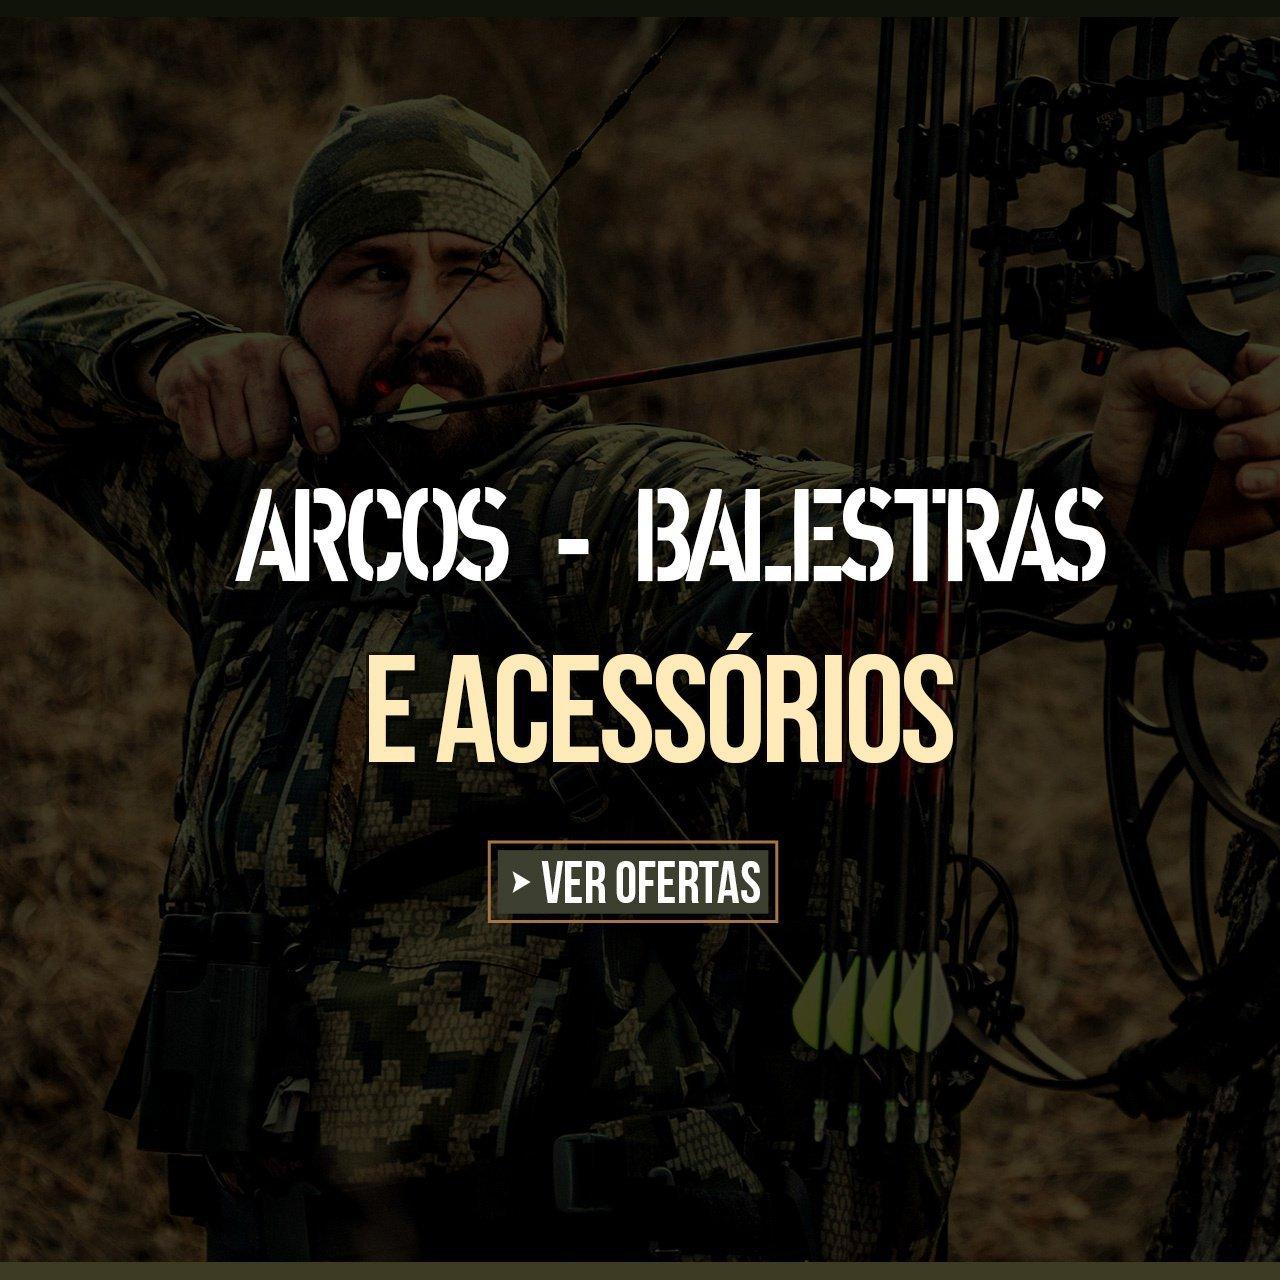 ARCOS, BALESTRAS E ACESSÓRIOS